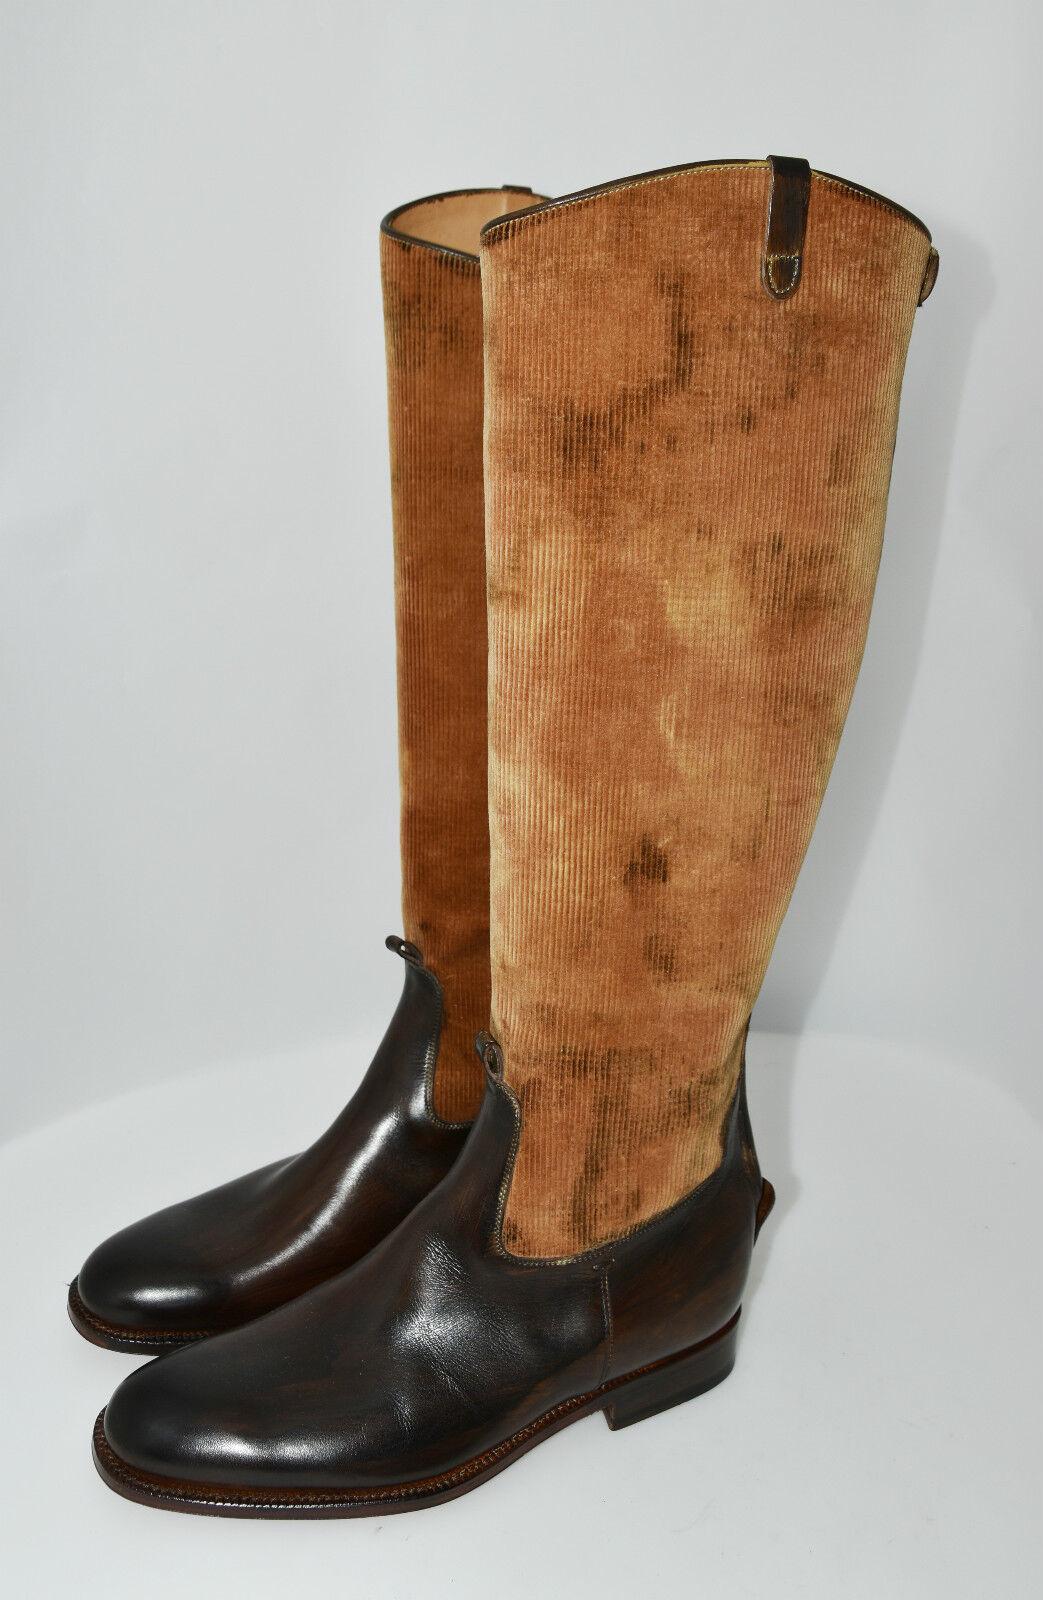 WOMAN ZIPPER BOOT - STIVALE women - 37 - CALF+VELVET - VITELLO+VELLUTO -LTH SOLE